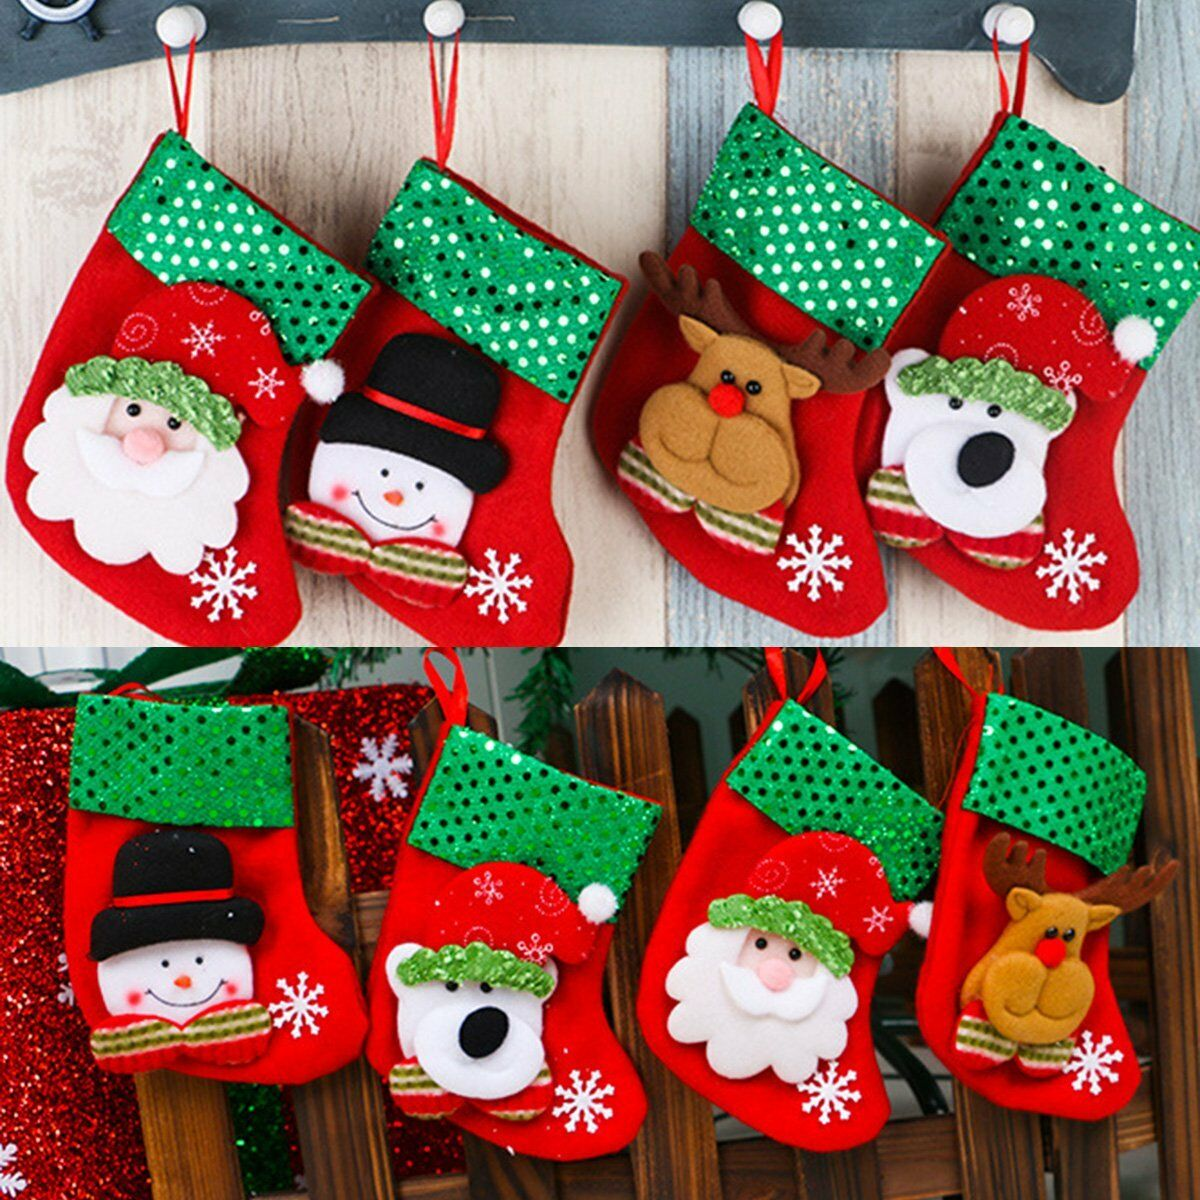 Christmas Socks Santa Claus Snowman Elk Candy Gift Bag Sock Xmas Christmas Bags Hanging Decor недорого